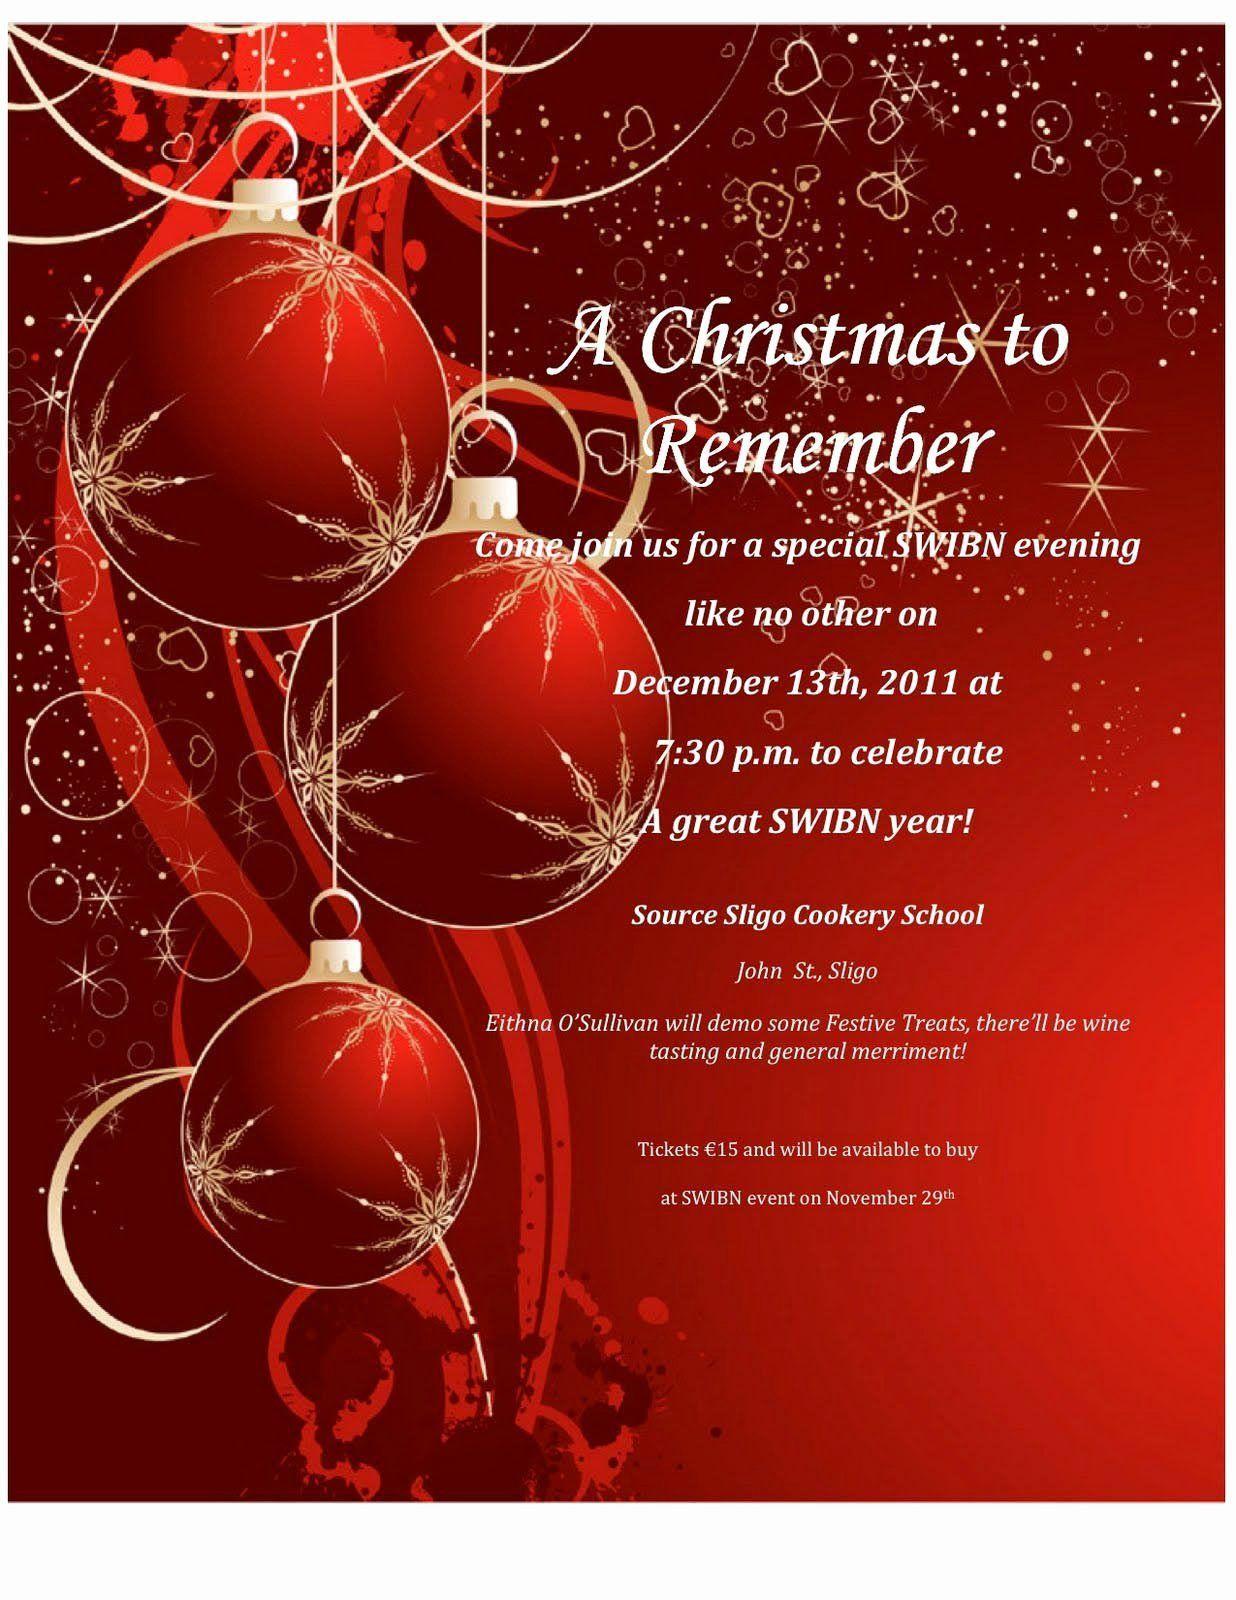 007 Wondrou Xma Party Invite Template Free Inspiration  Holiday Invitation Word Download ChristmaFull